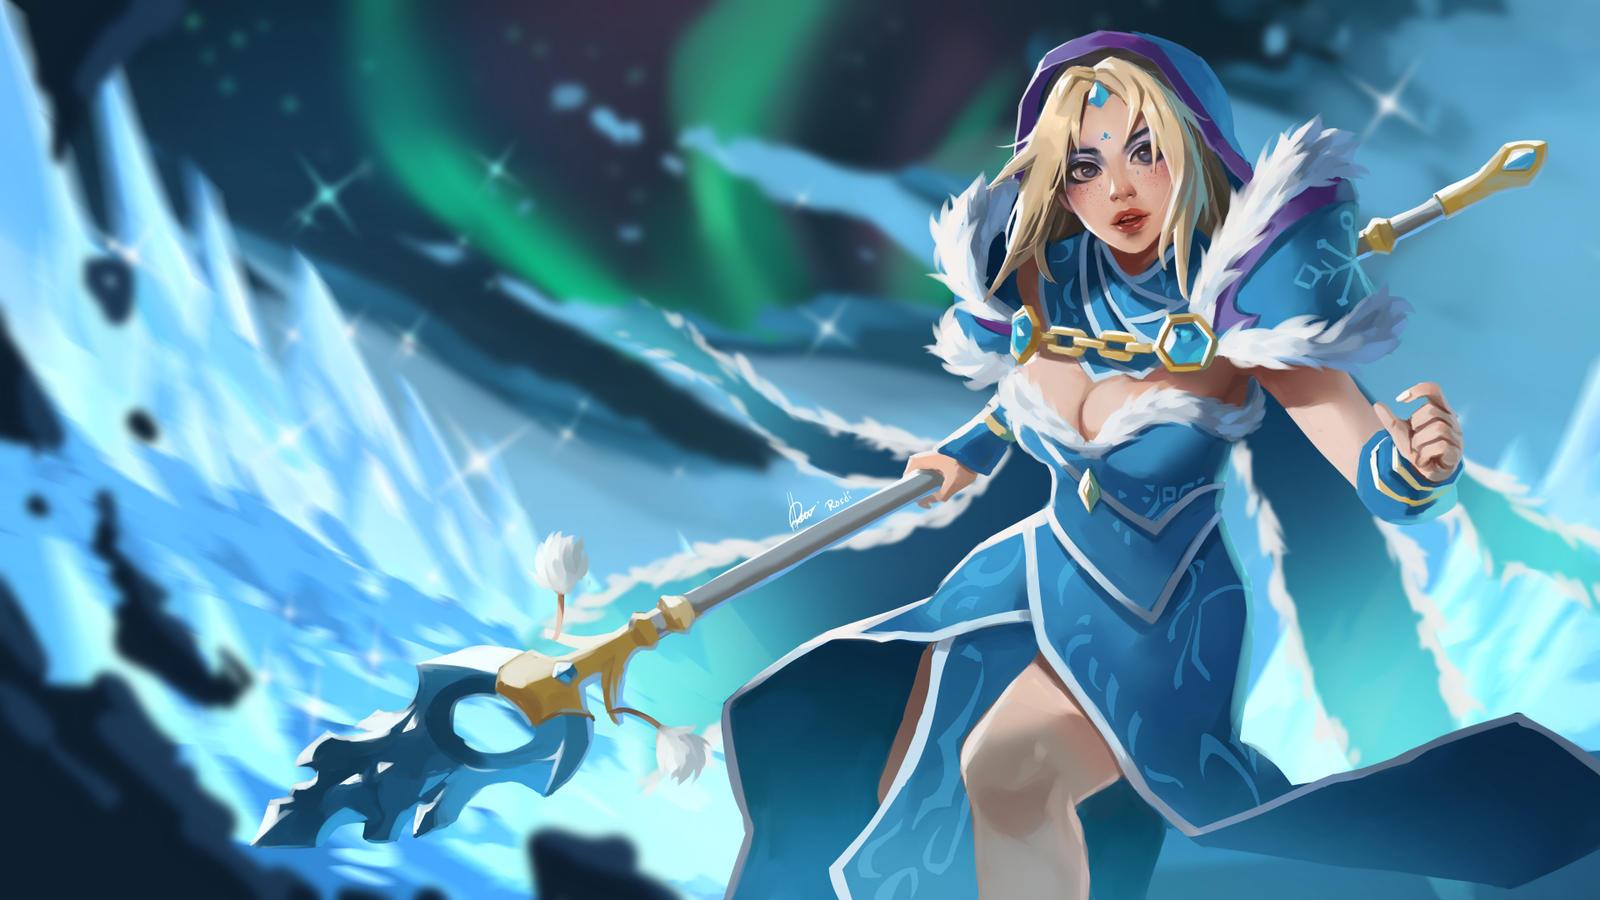 Crystal Maiden Arcana Wallpaper Hd